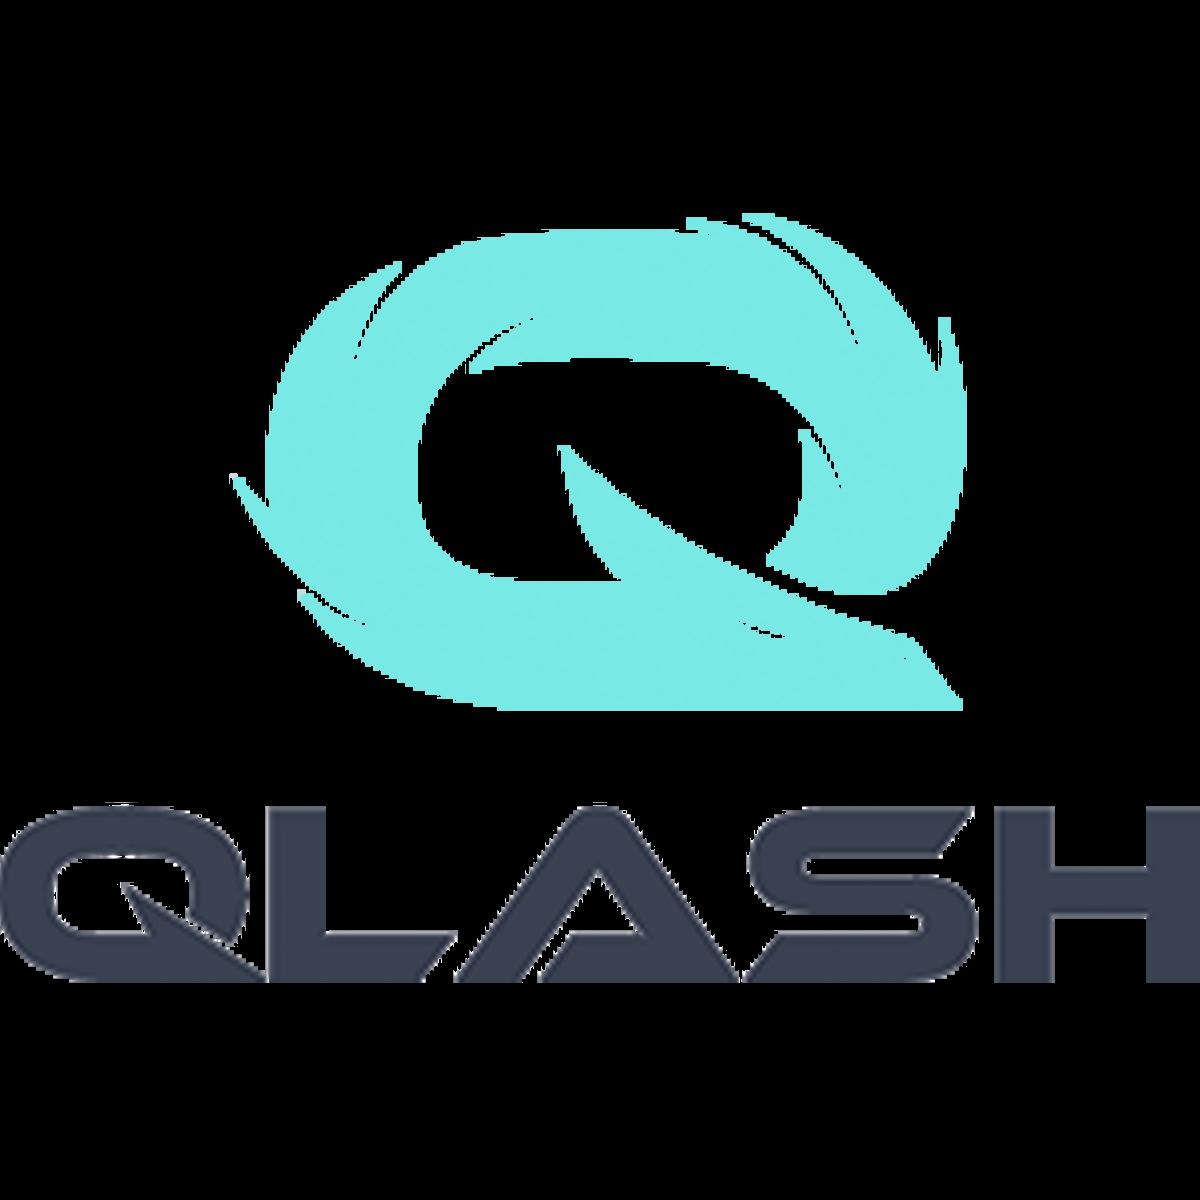 QLASHSpain